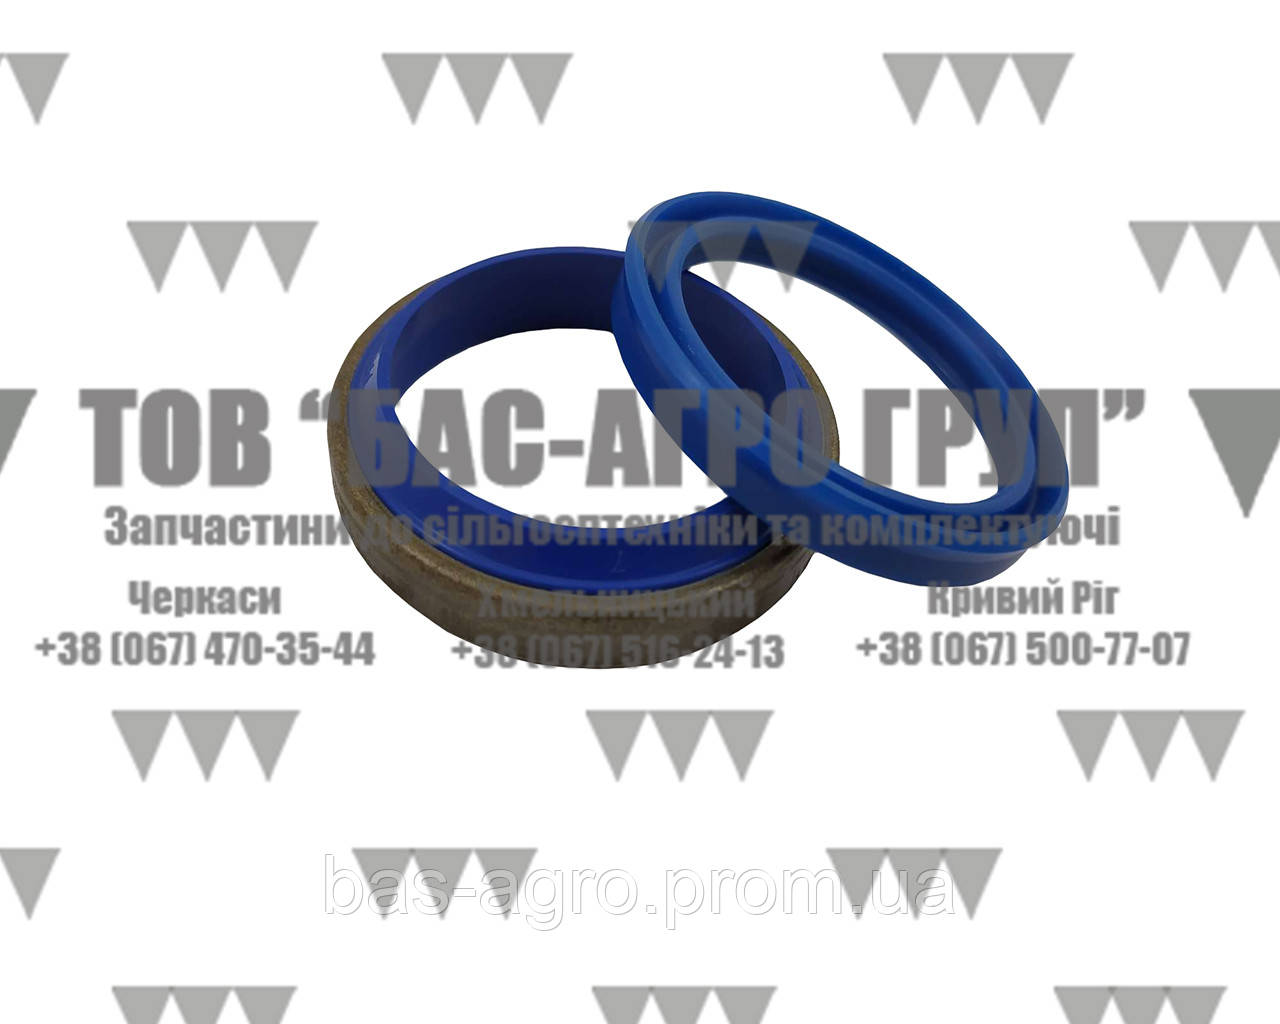 Комплект уплотнений цилиндра маркера 4559-1 (10188990) Monosem аналог